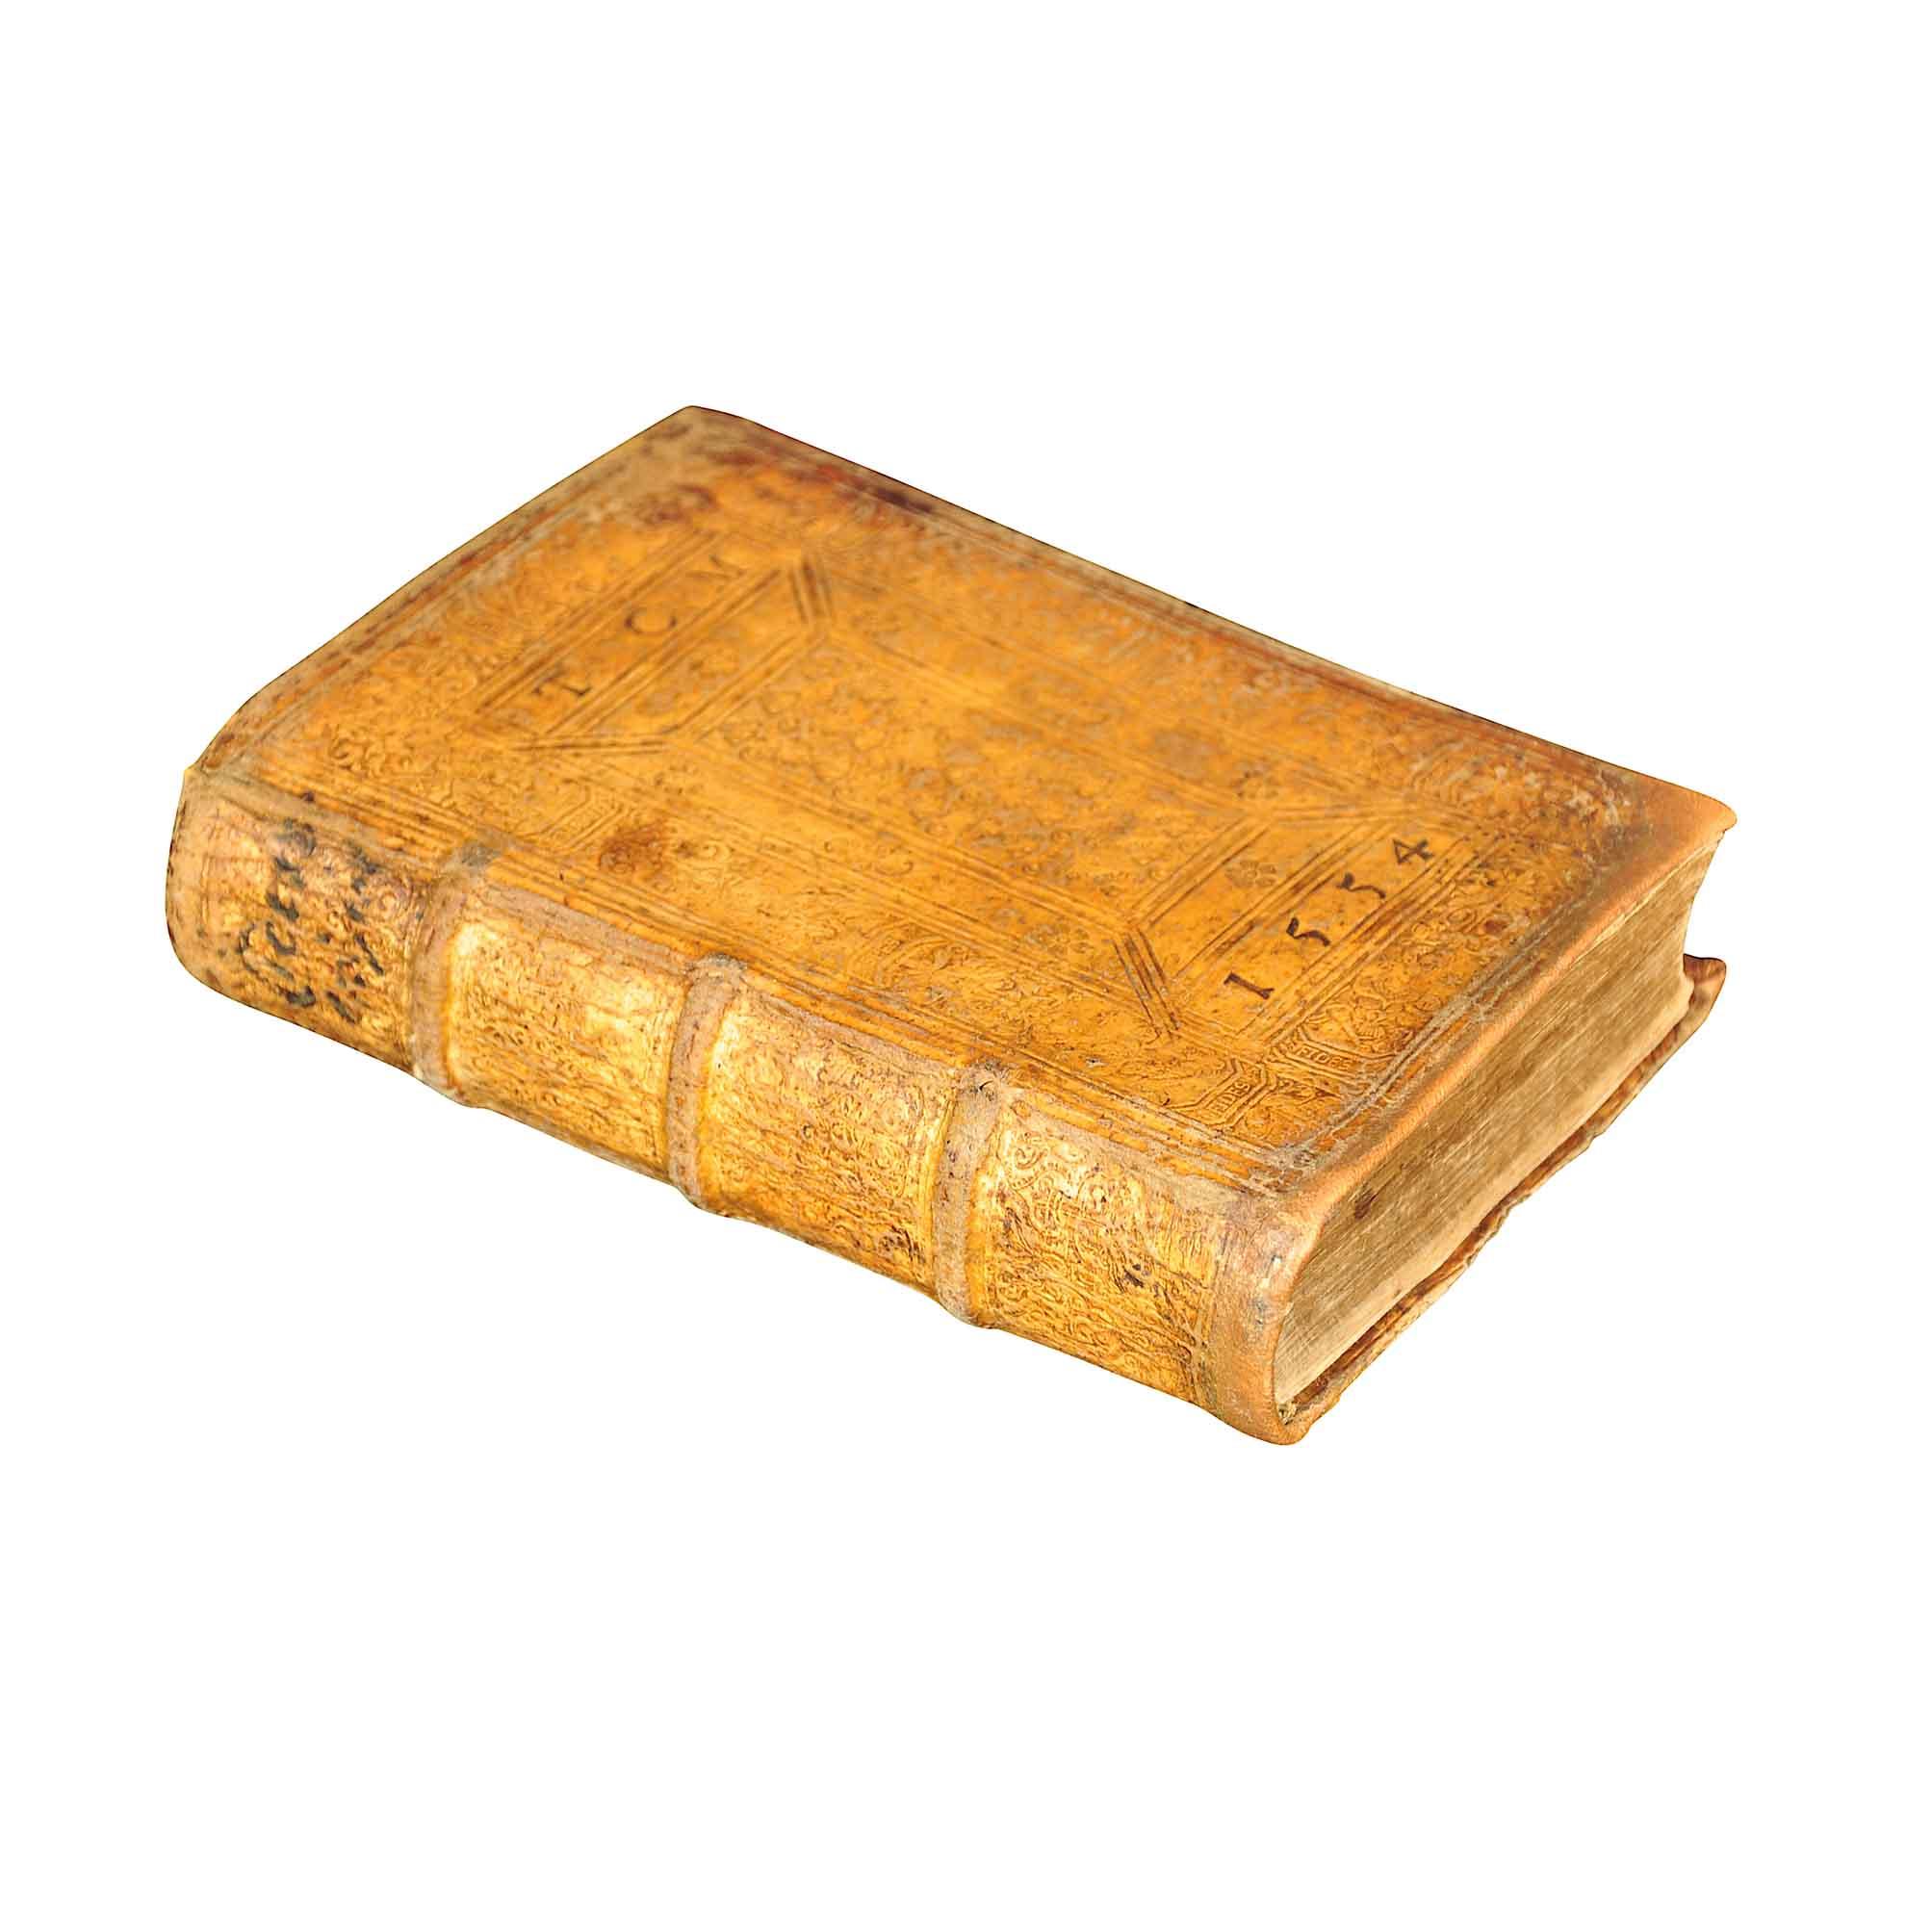 5681-Cicero-Epistolae-Familiares-1552-Binding-free-N.jpg